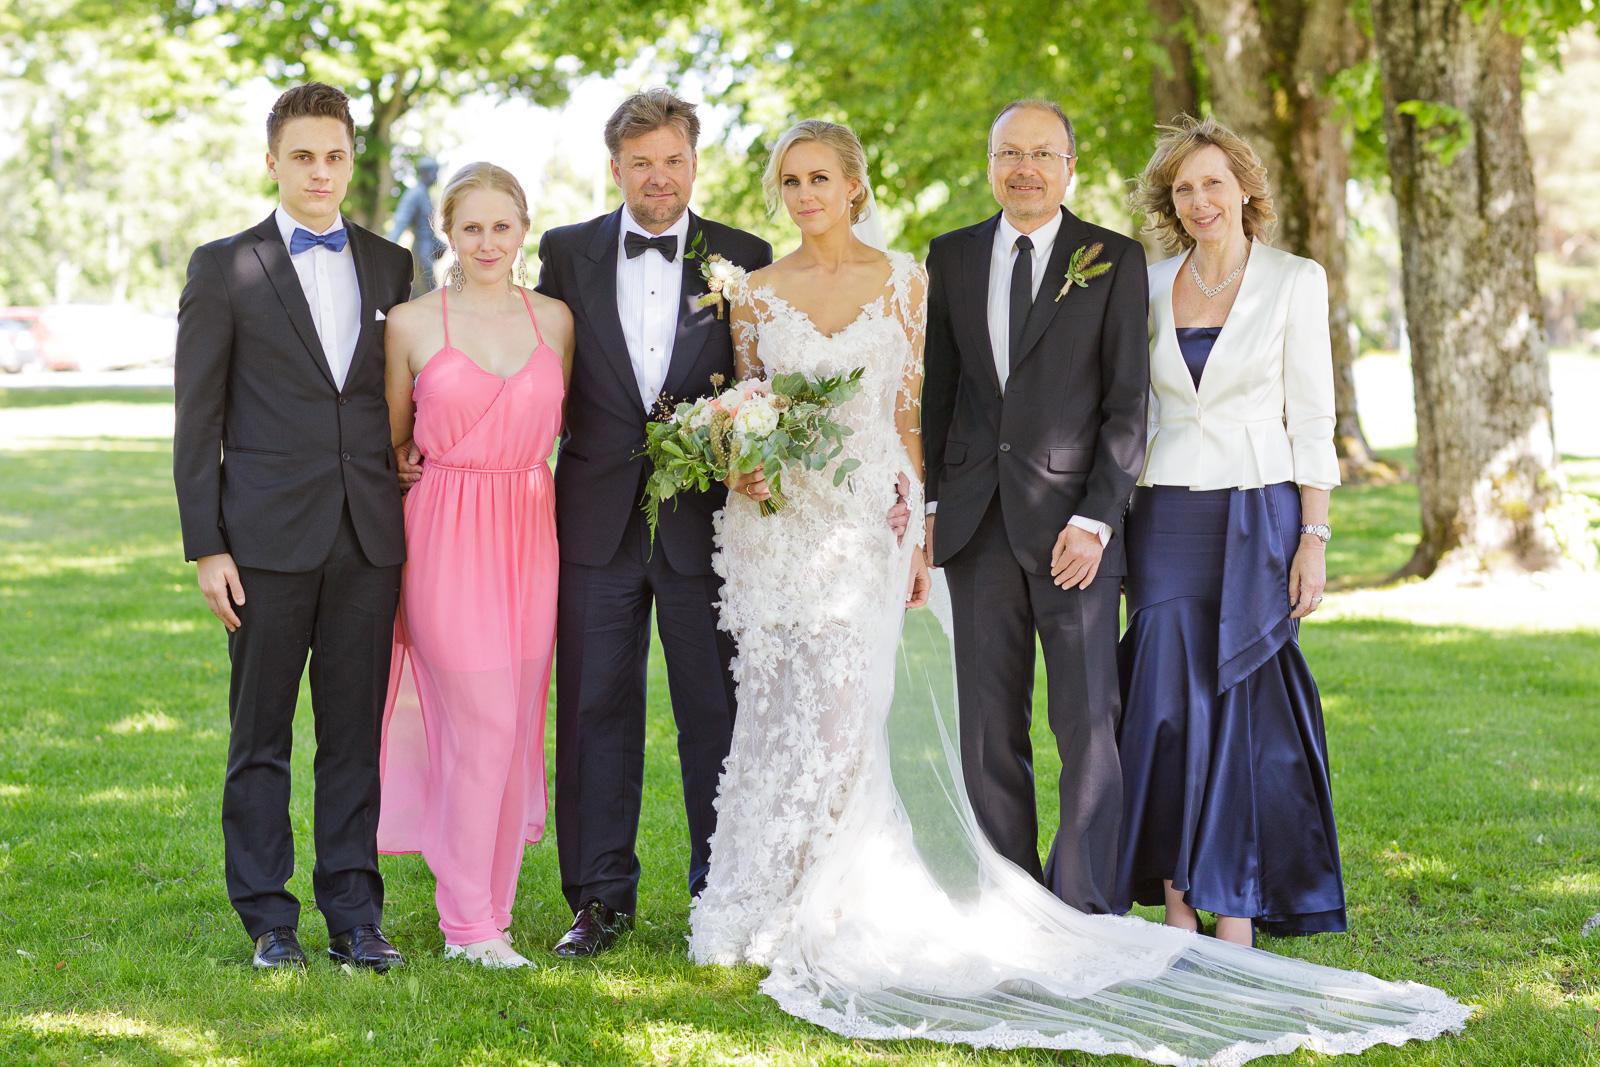 41 Støtvig hotel bryllup